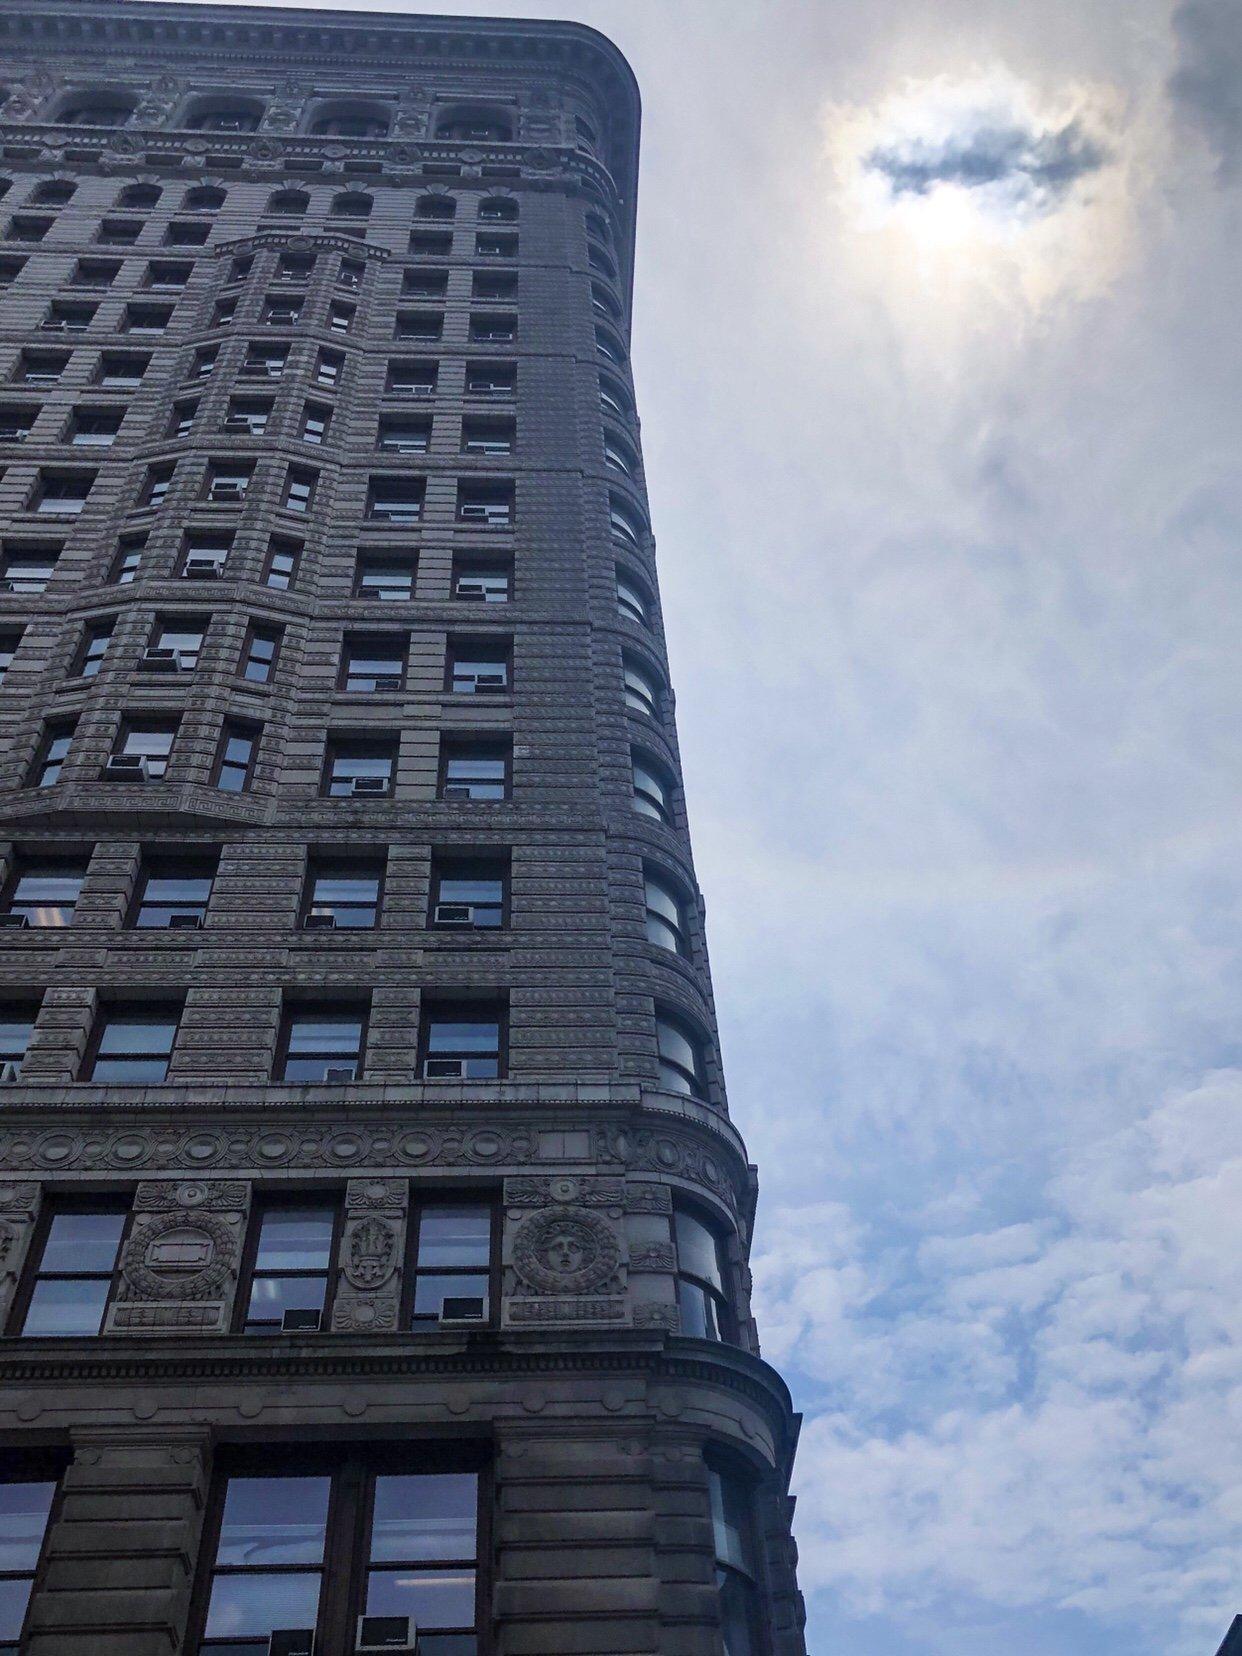 4 Tage in New York City -Flat Iron Building - Nowshine Reiseblog ü 40